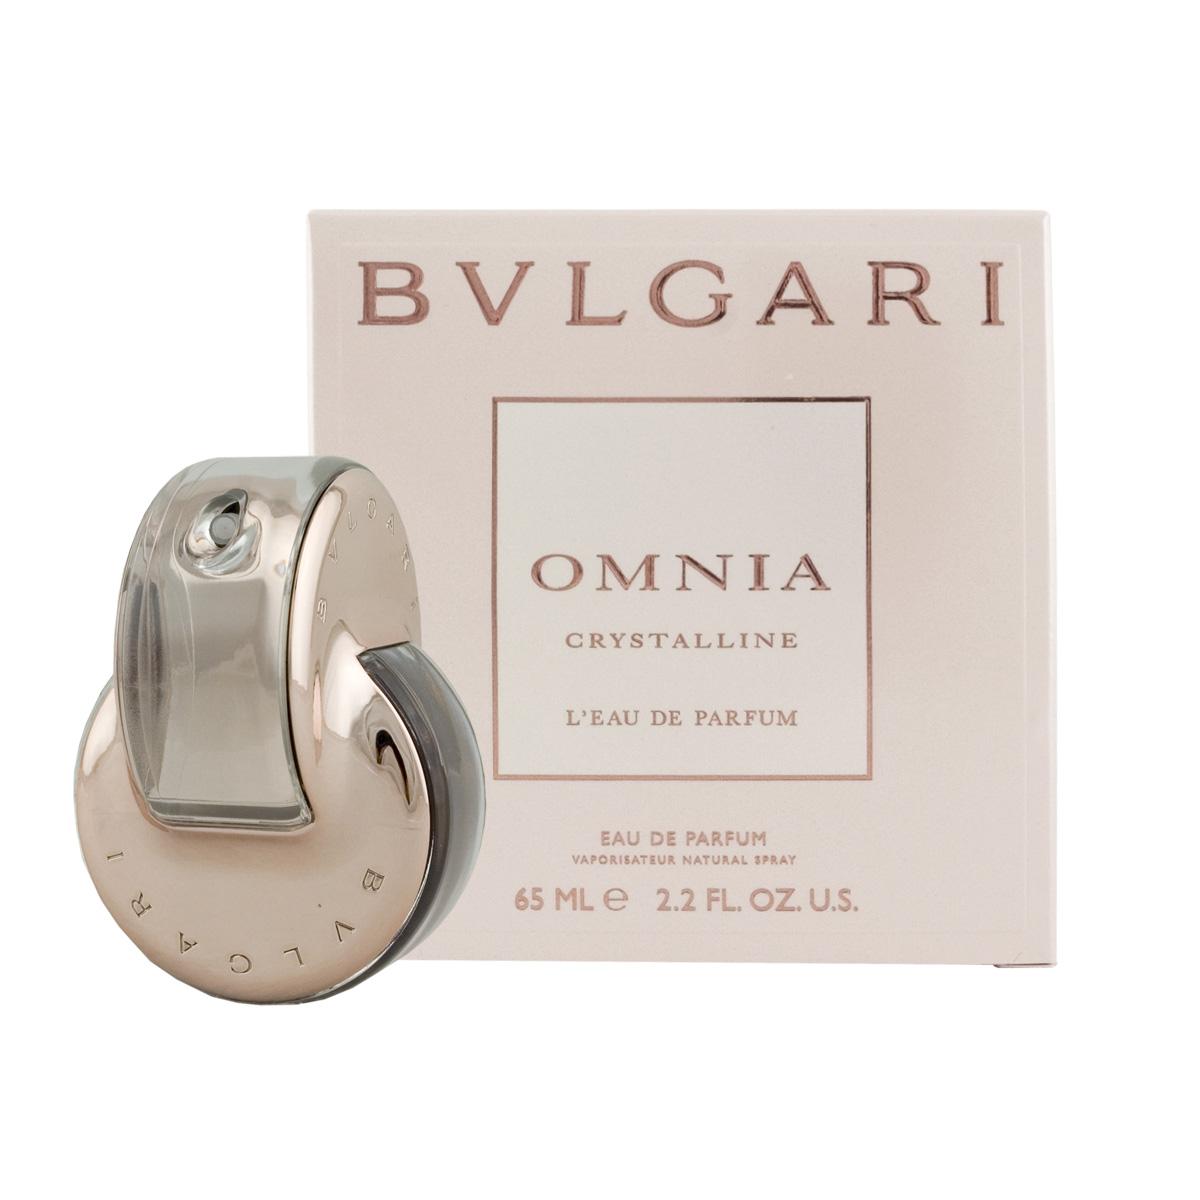 Bvlgari Omnia Crystalline L'Eau de Parfum EDP tester 65 ml W